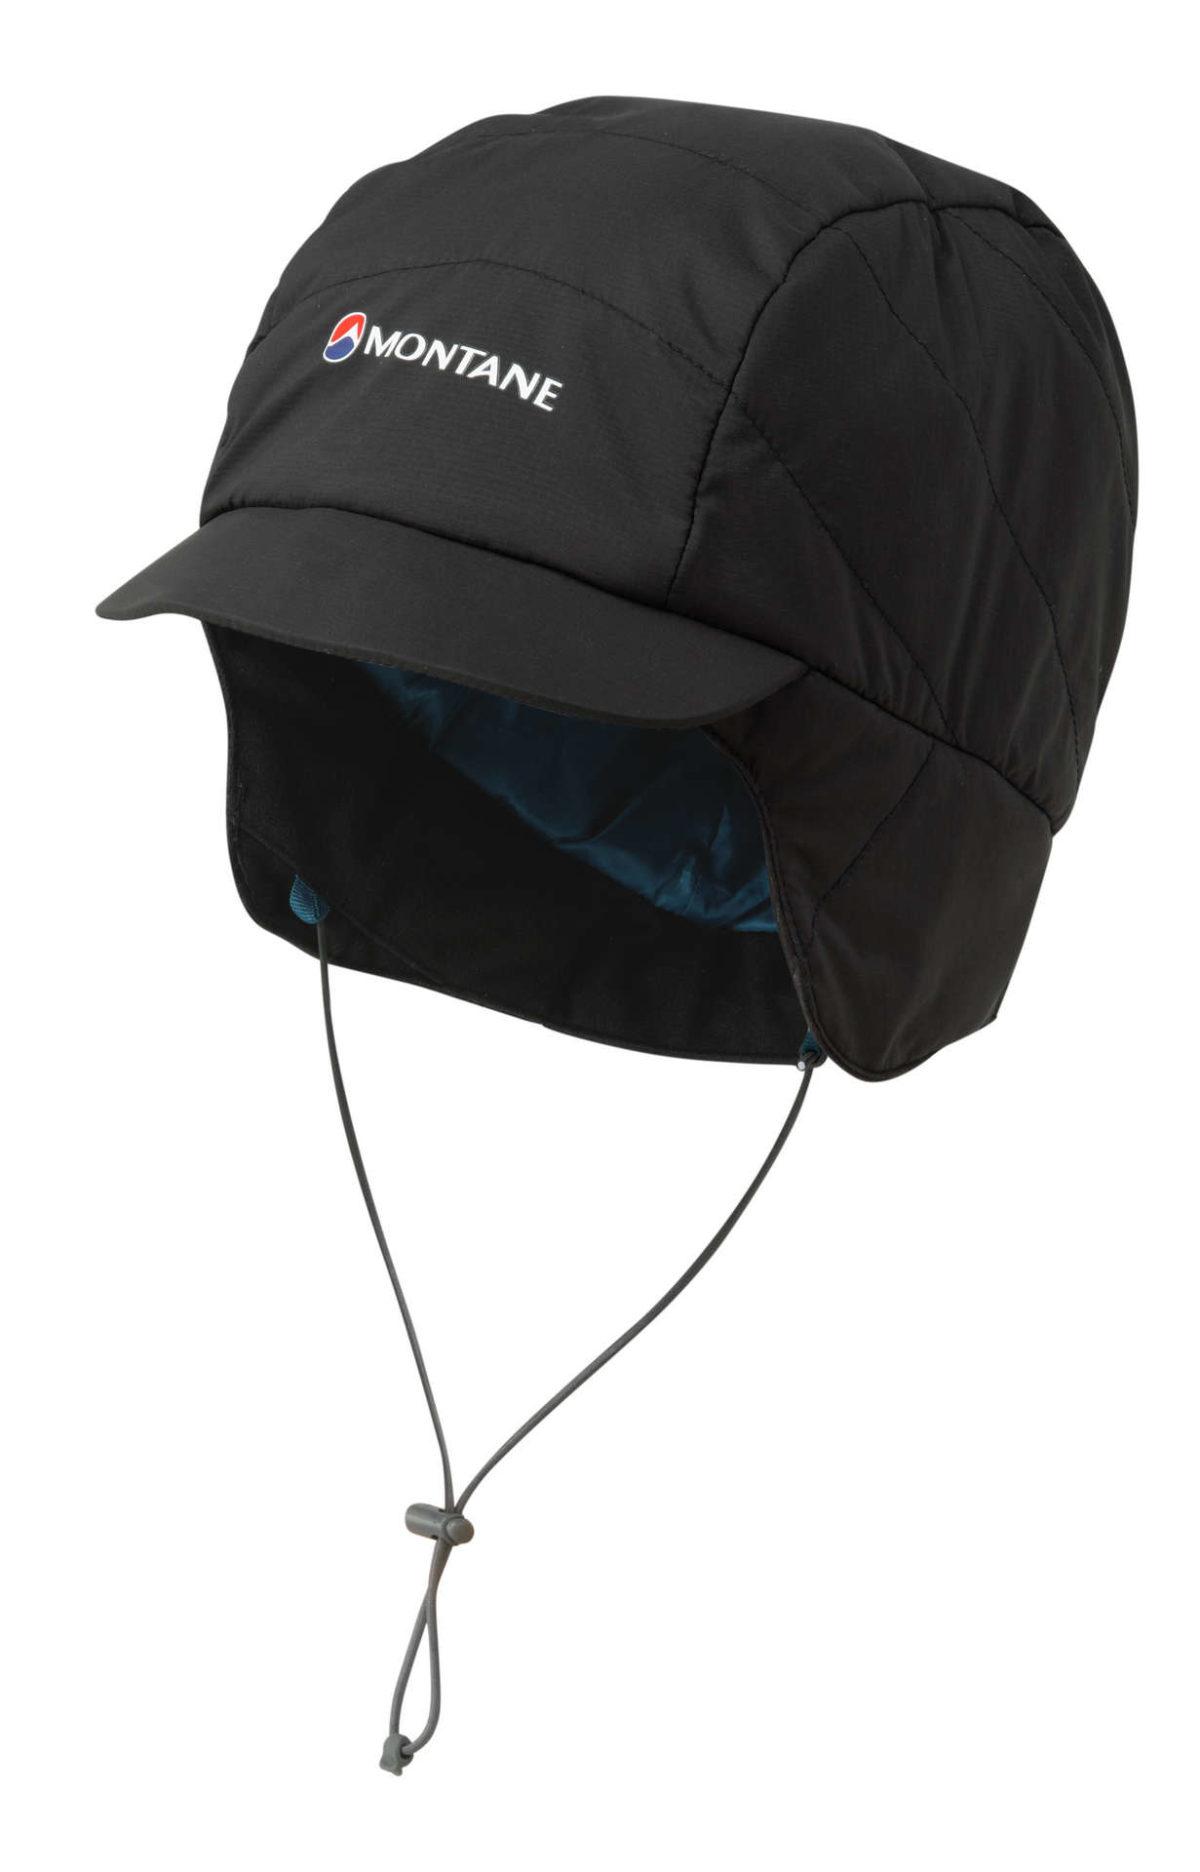 Expedition headwear